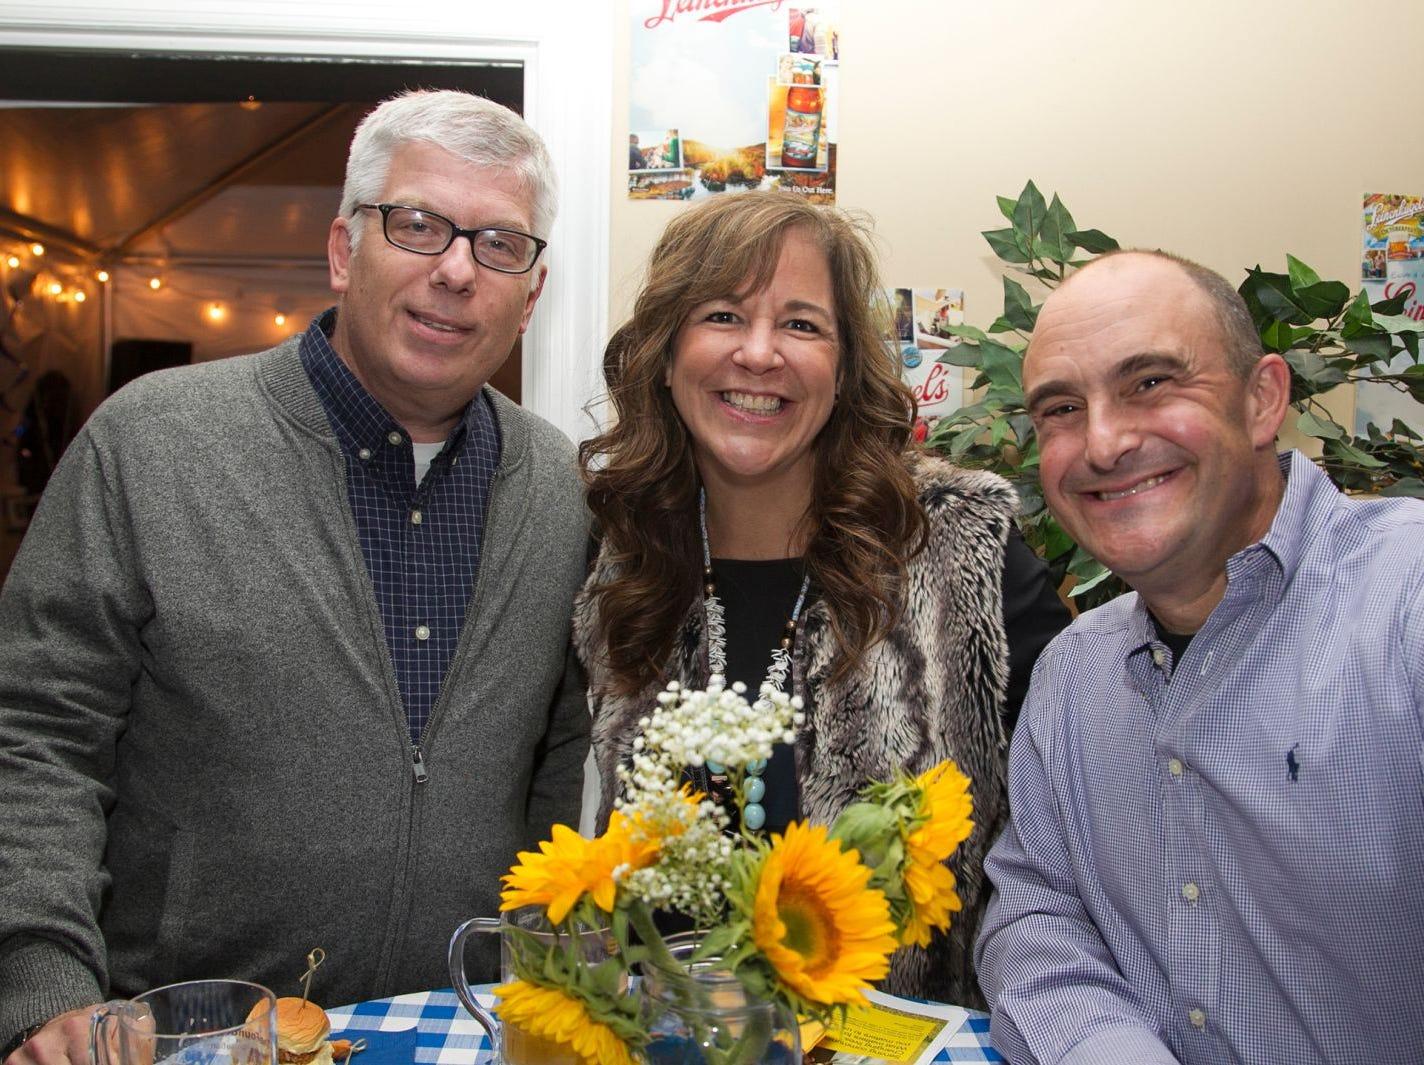 David Poelsha, Stacie Poelsha, Paul Semendinger (Hanes Principal). Ridgewood Education Foundation's 2018 Oktoberfest at the Hermitage. 09/29/2018